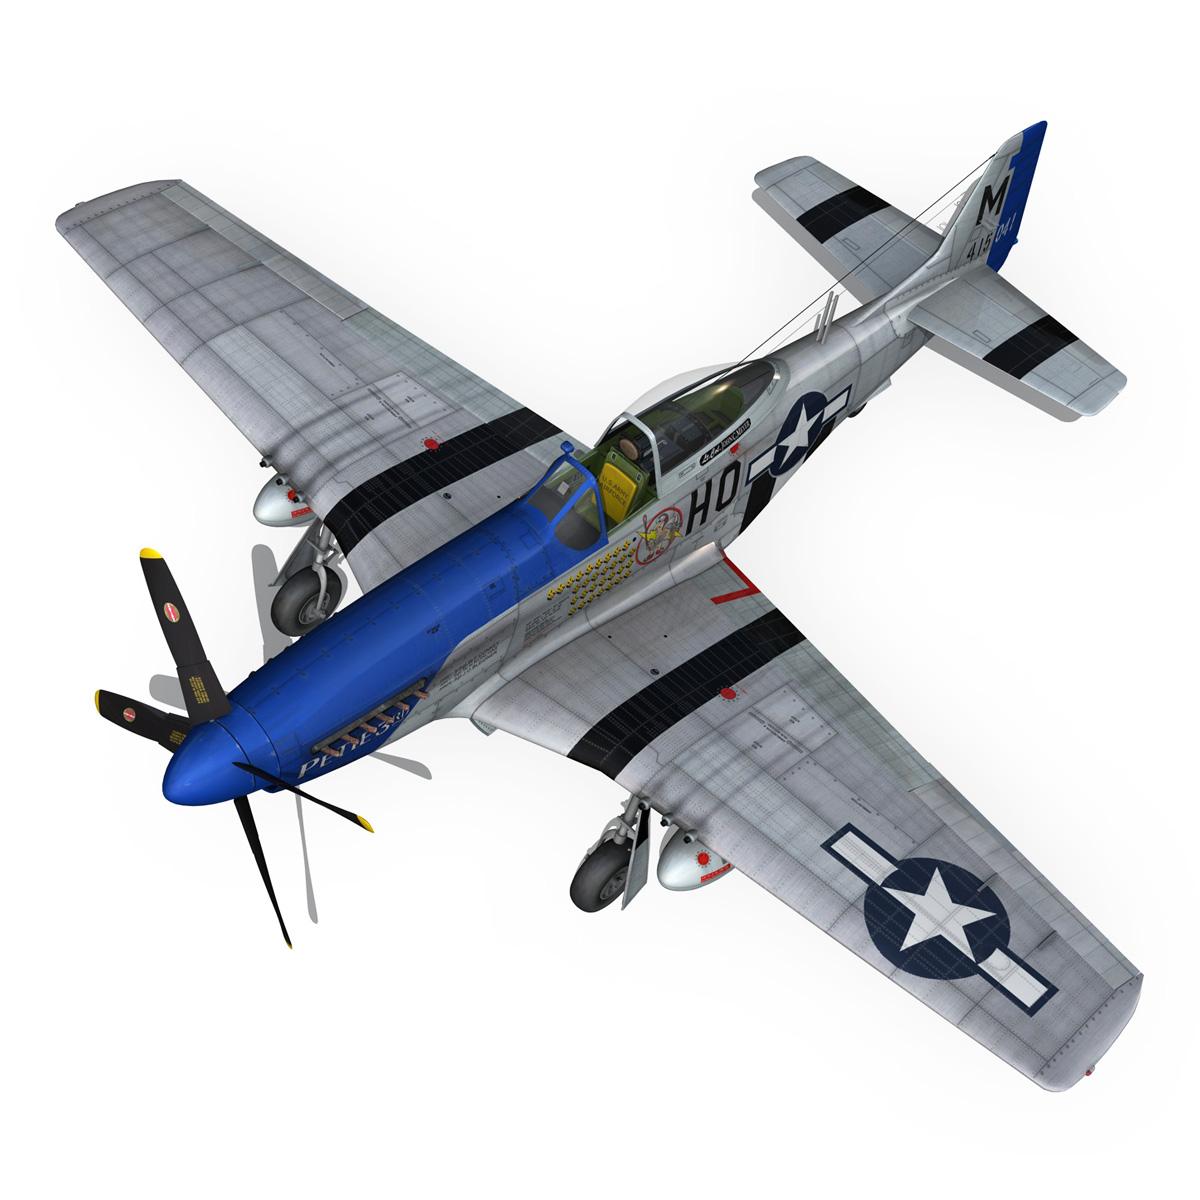 north american p-51d mustang – petie 3rd 3d model fbx c4d lwo obj 280136